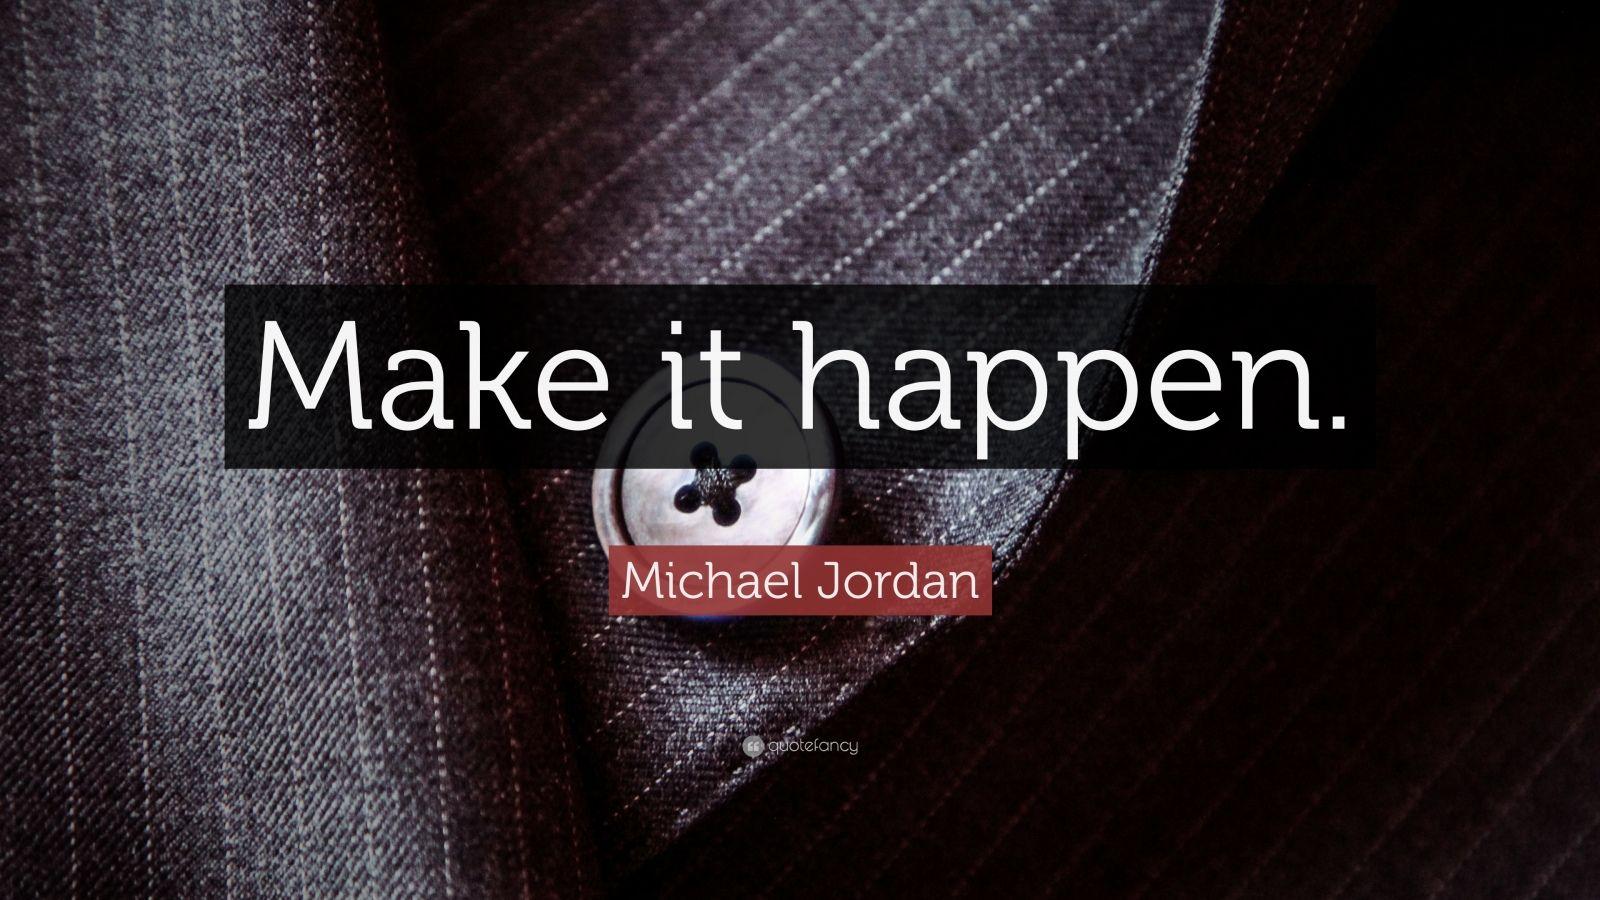 michael jordan quote   u201cmake it happen  u201d  31 wallpapers